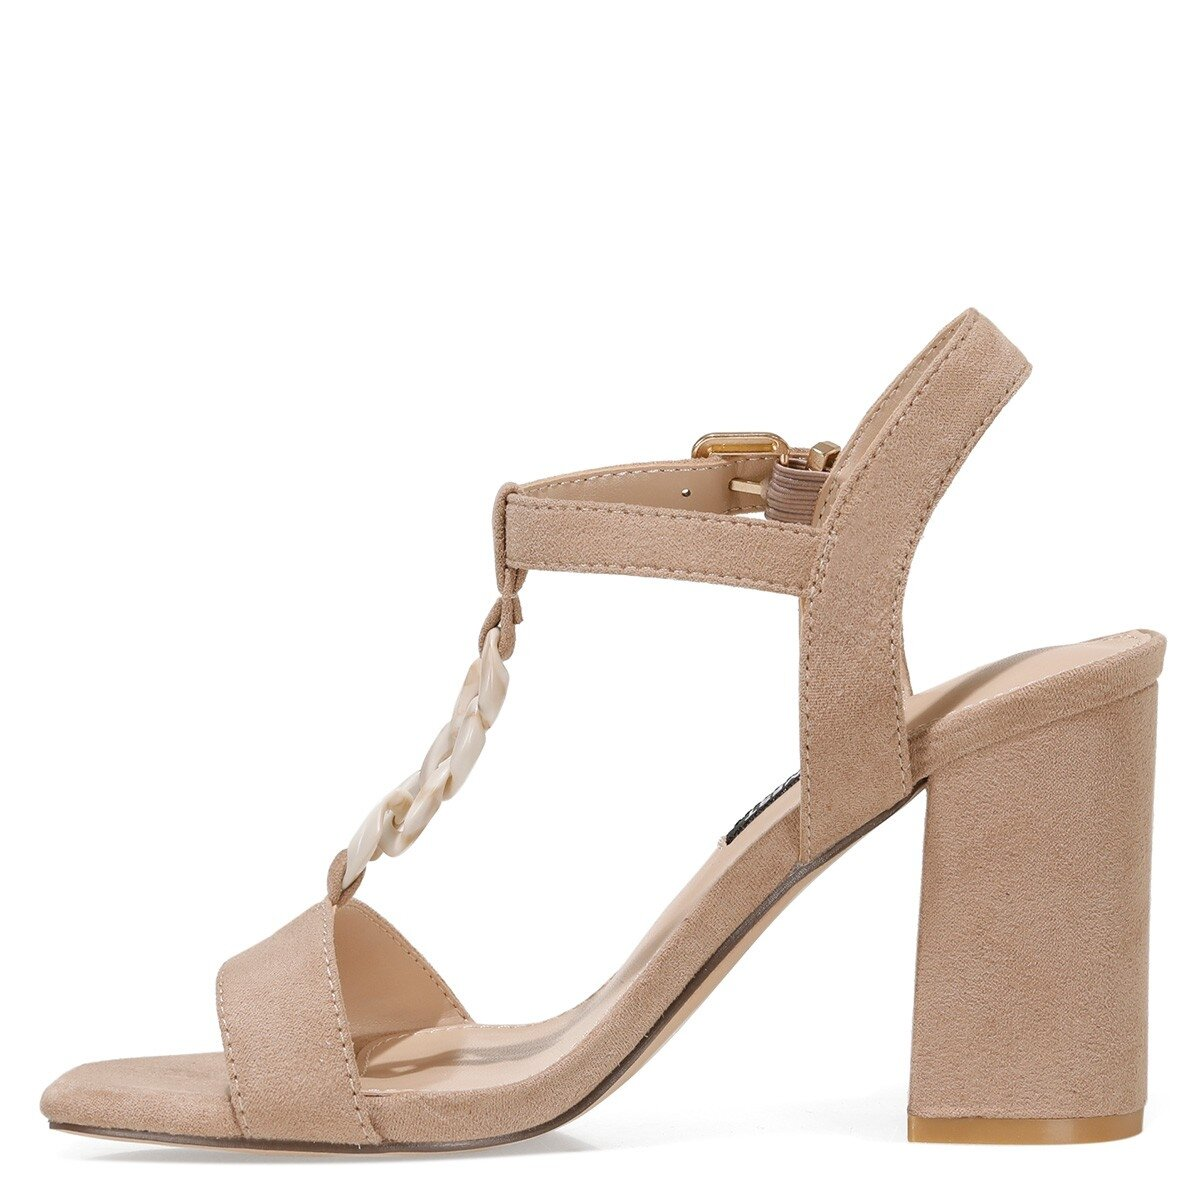 LOYAL 1FX Naturel Kadın Topuklu Sandalet